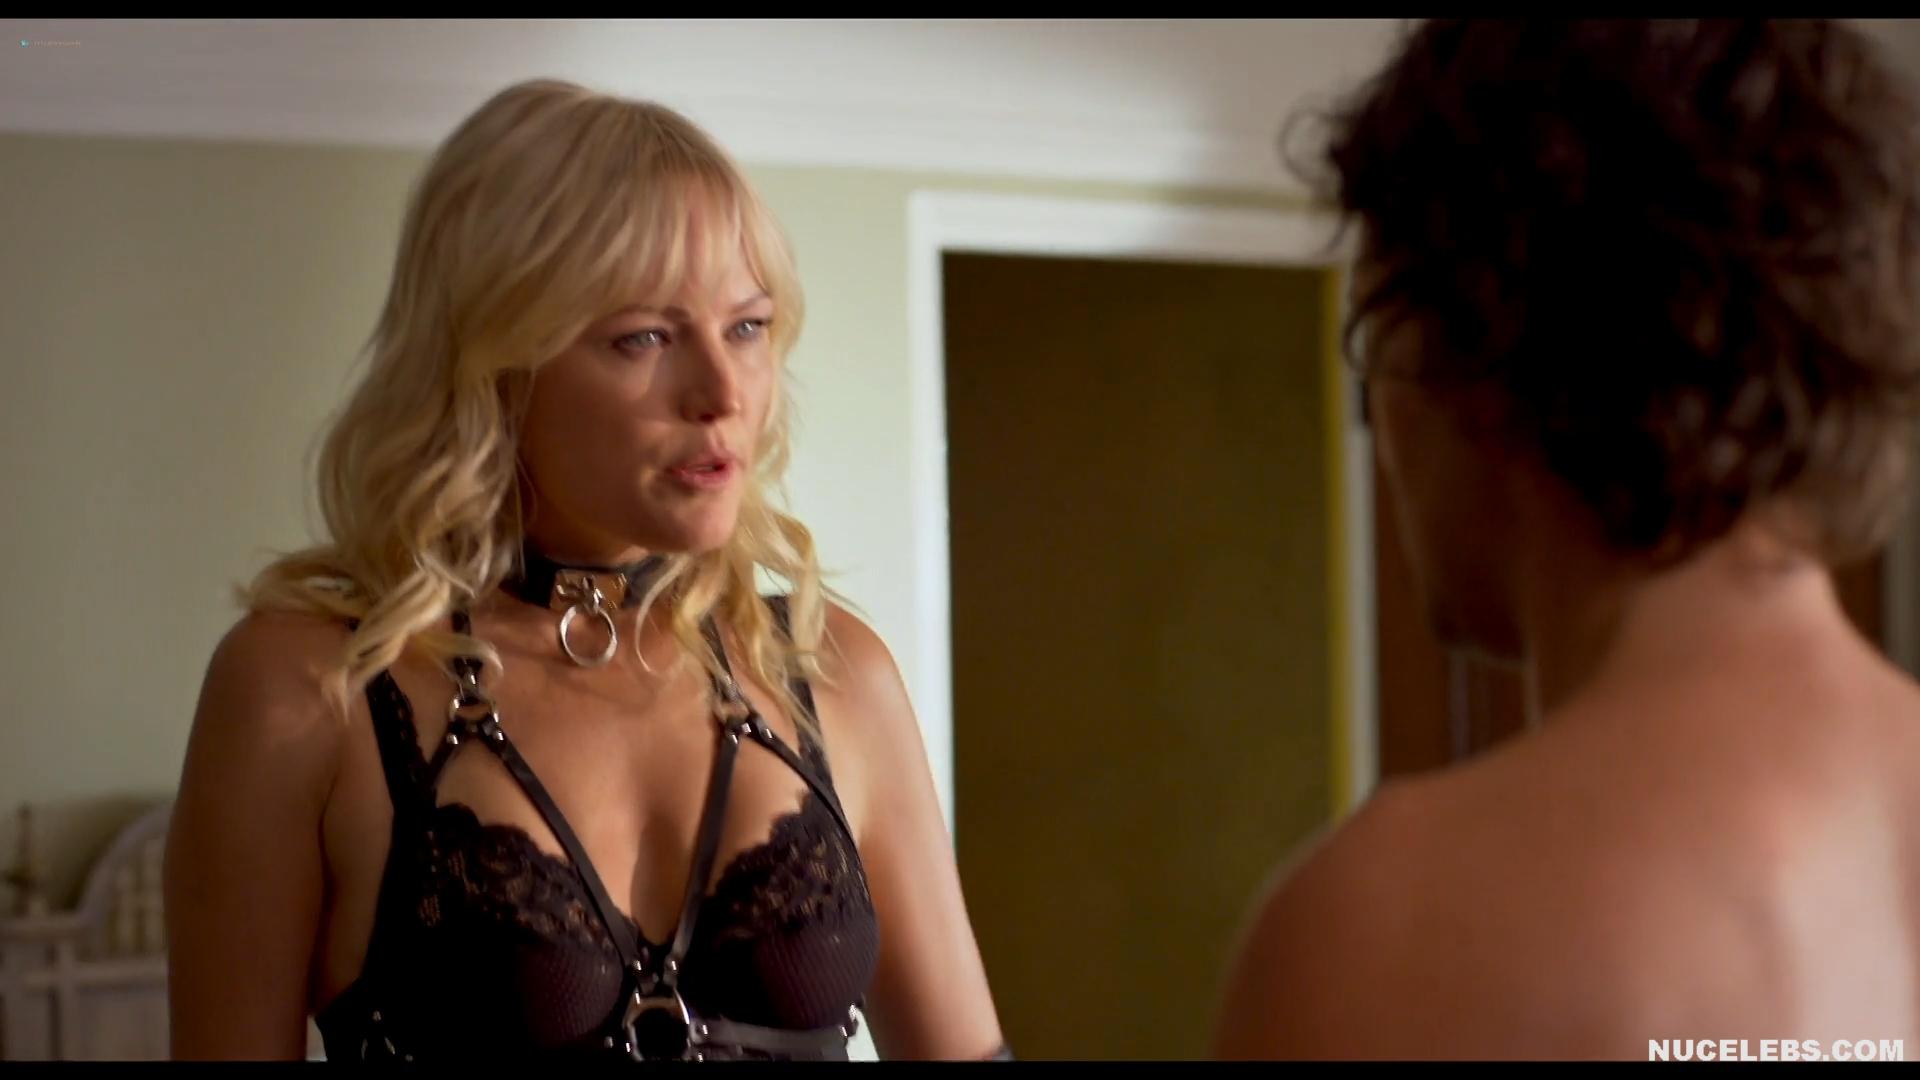 Malin Akerman Lingerie Domination And Sex Scenes